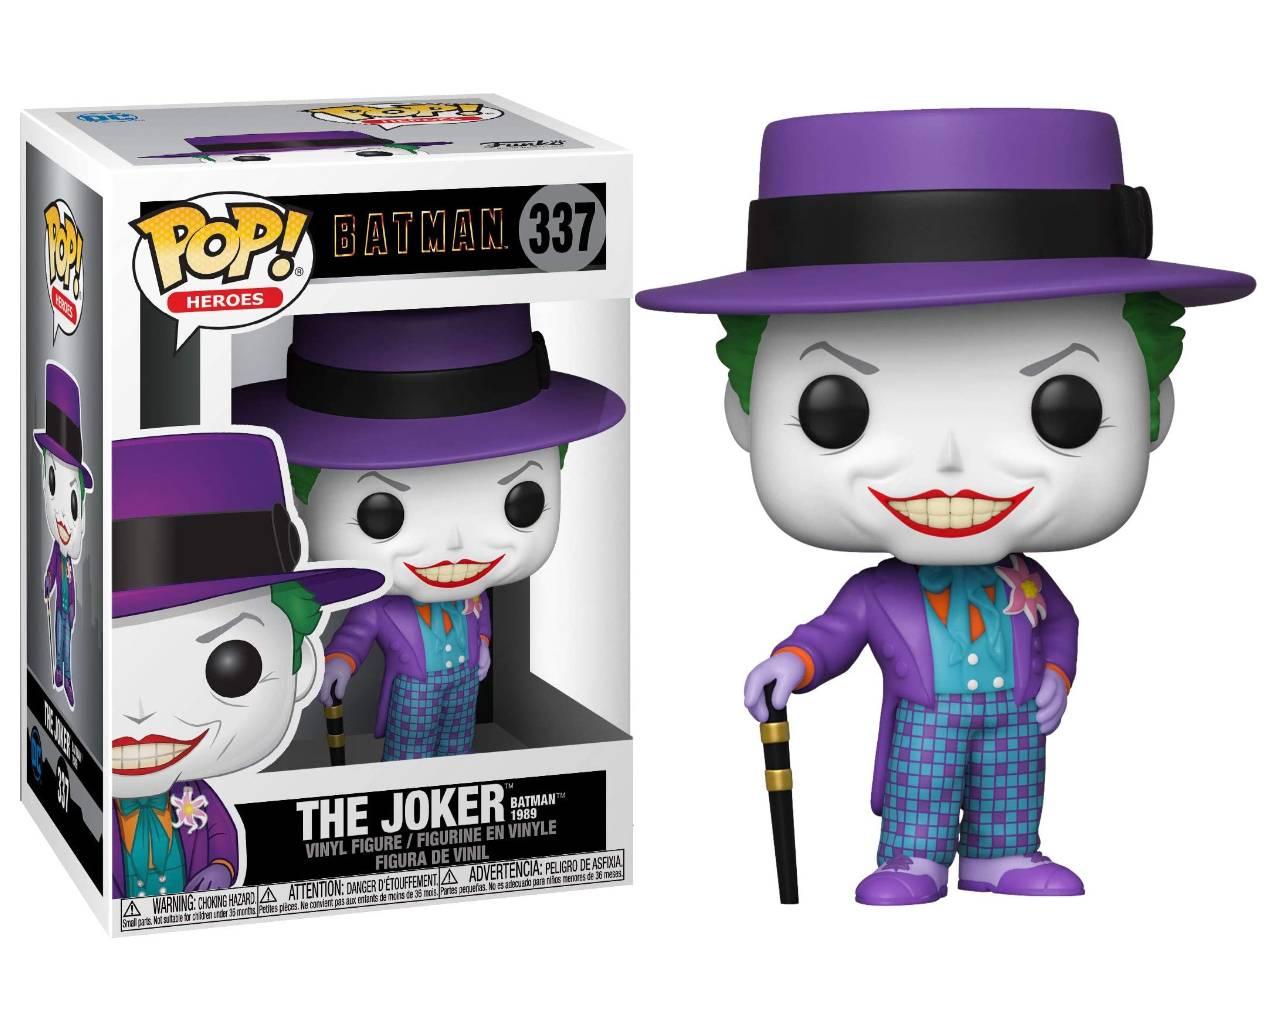 The Joker (Batman 1989) Pop! Vinyl